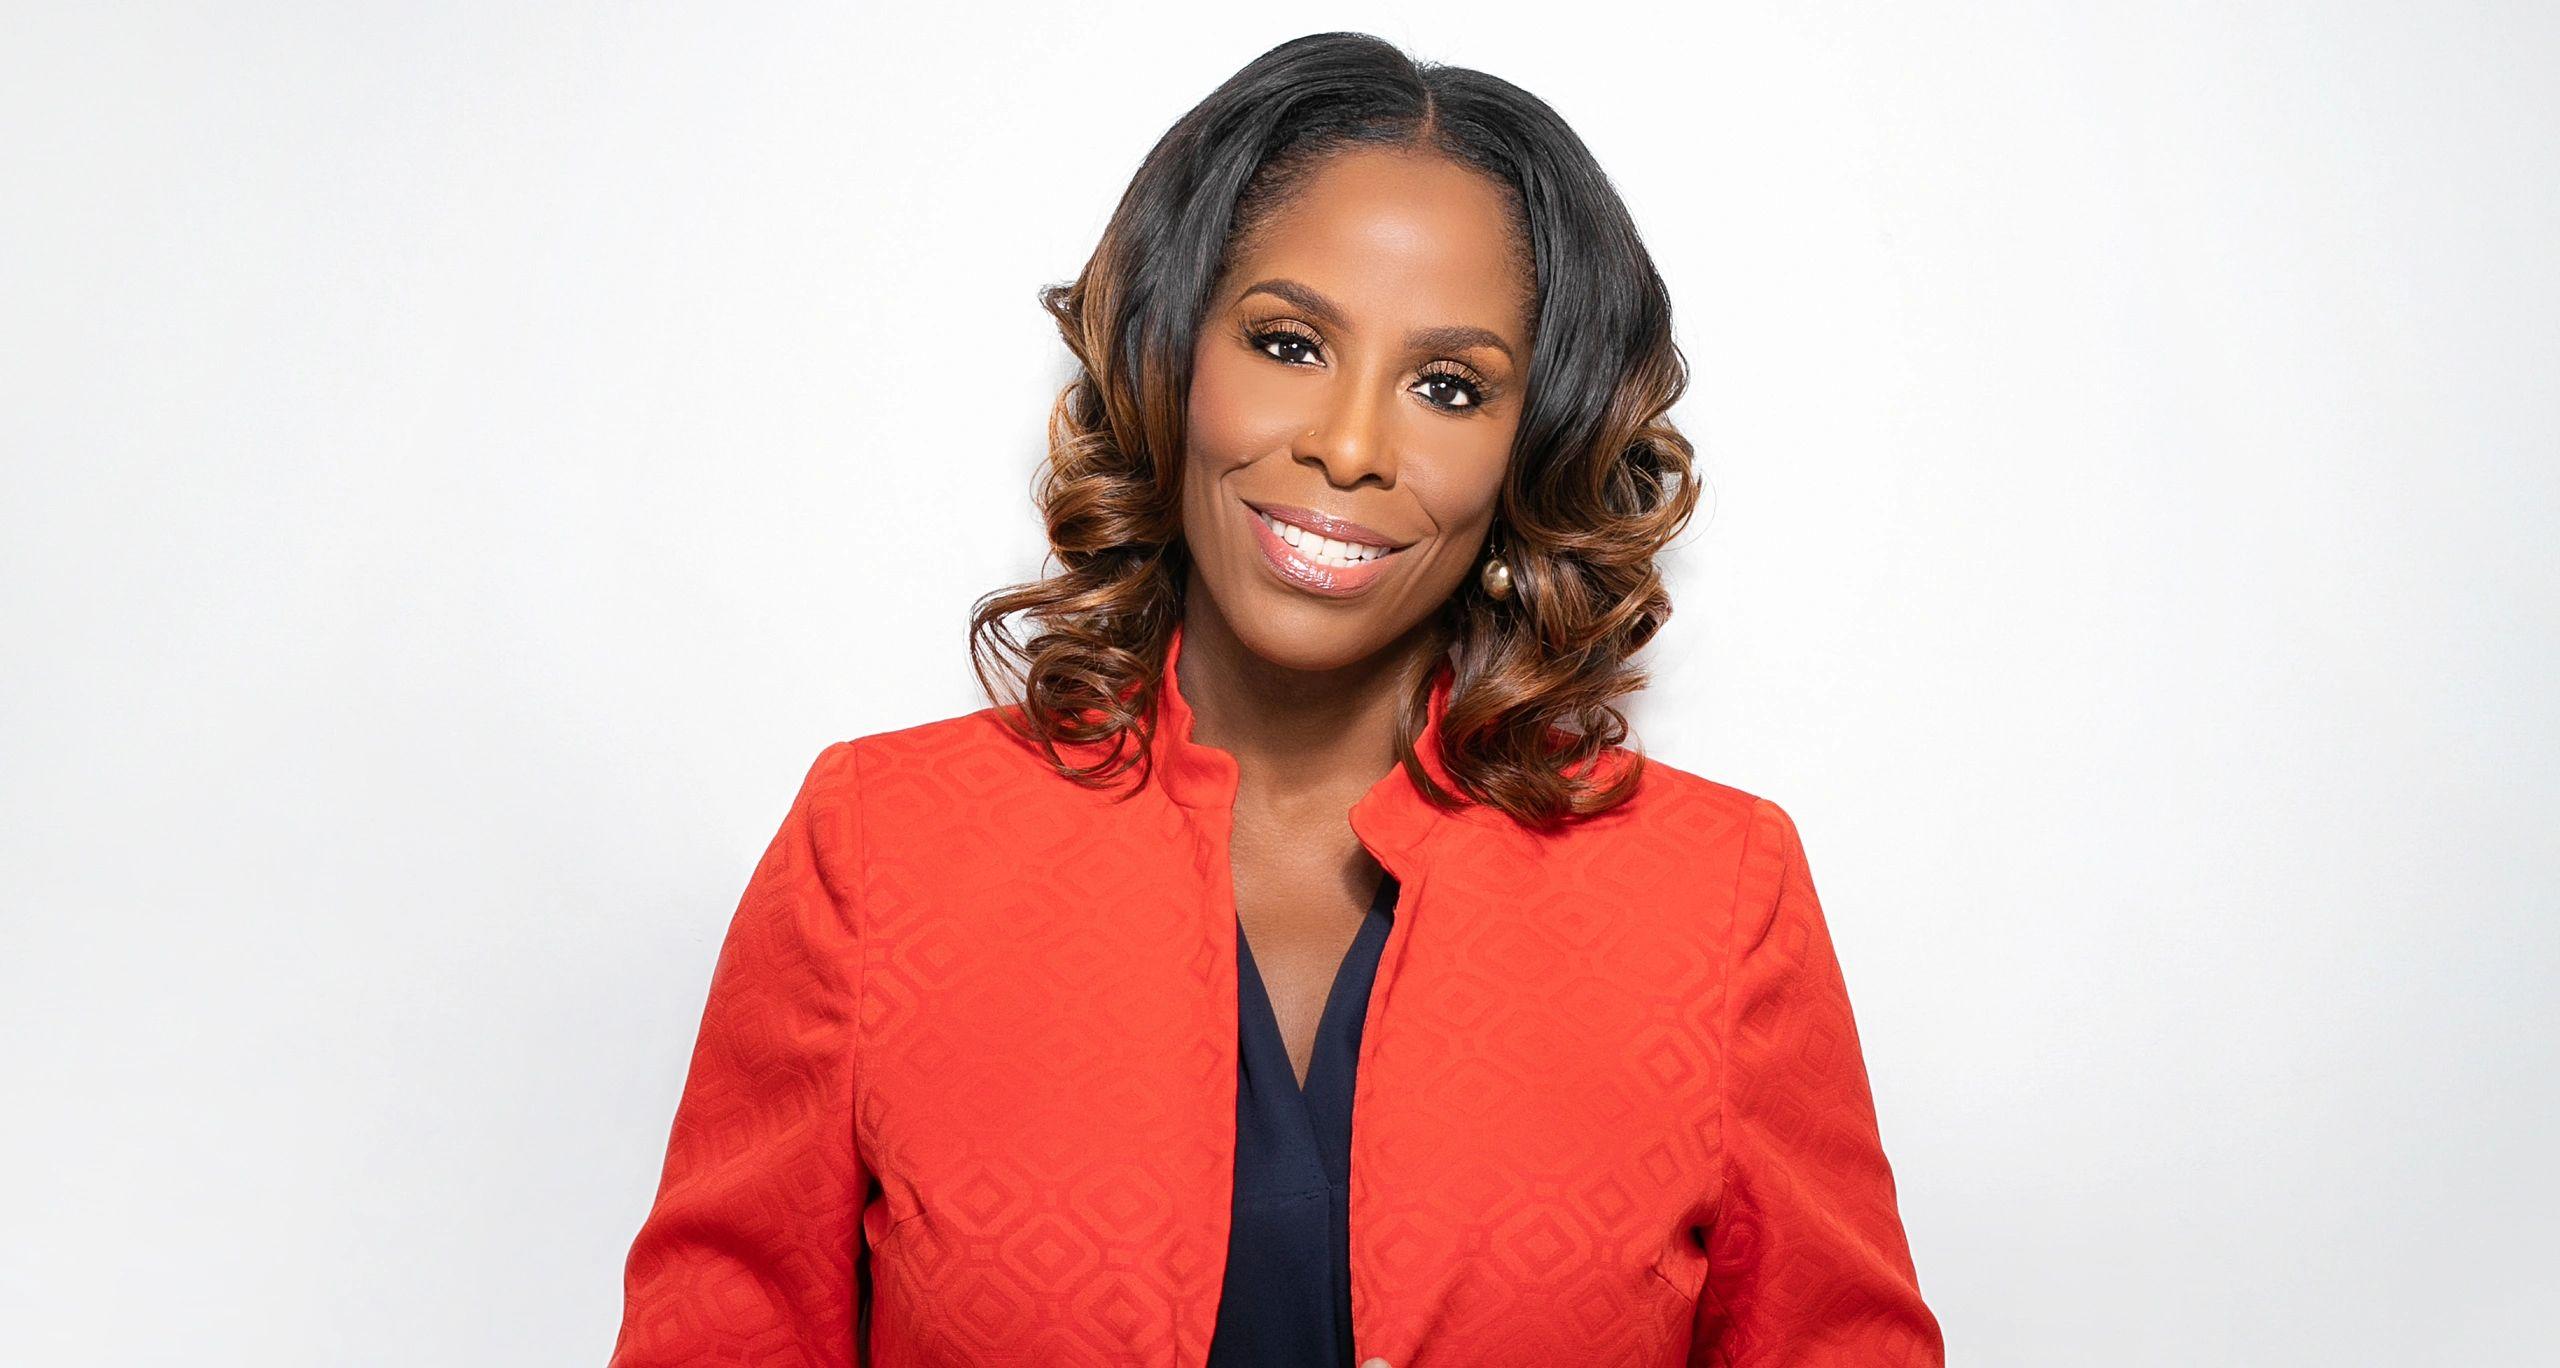 VI for Plaskett - Virgin Islands Congresswoman